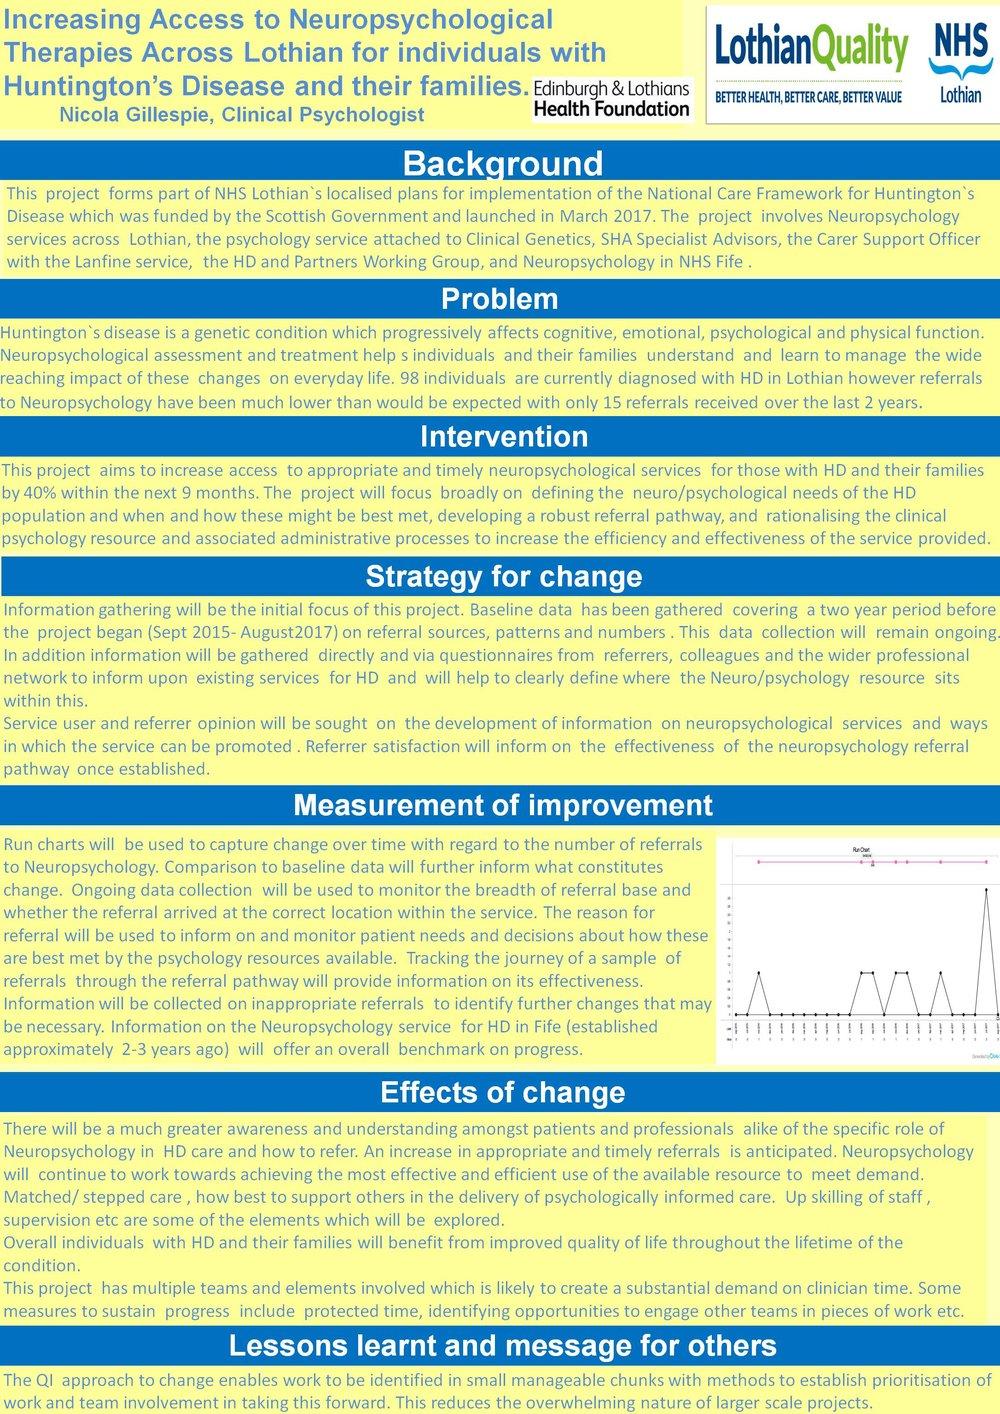 10 Nicola Poster presentation (final) -QI HD Project Nov 2017.jpg